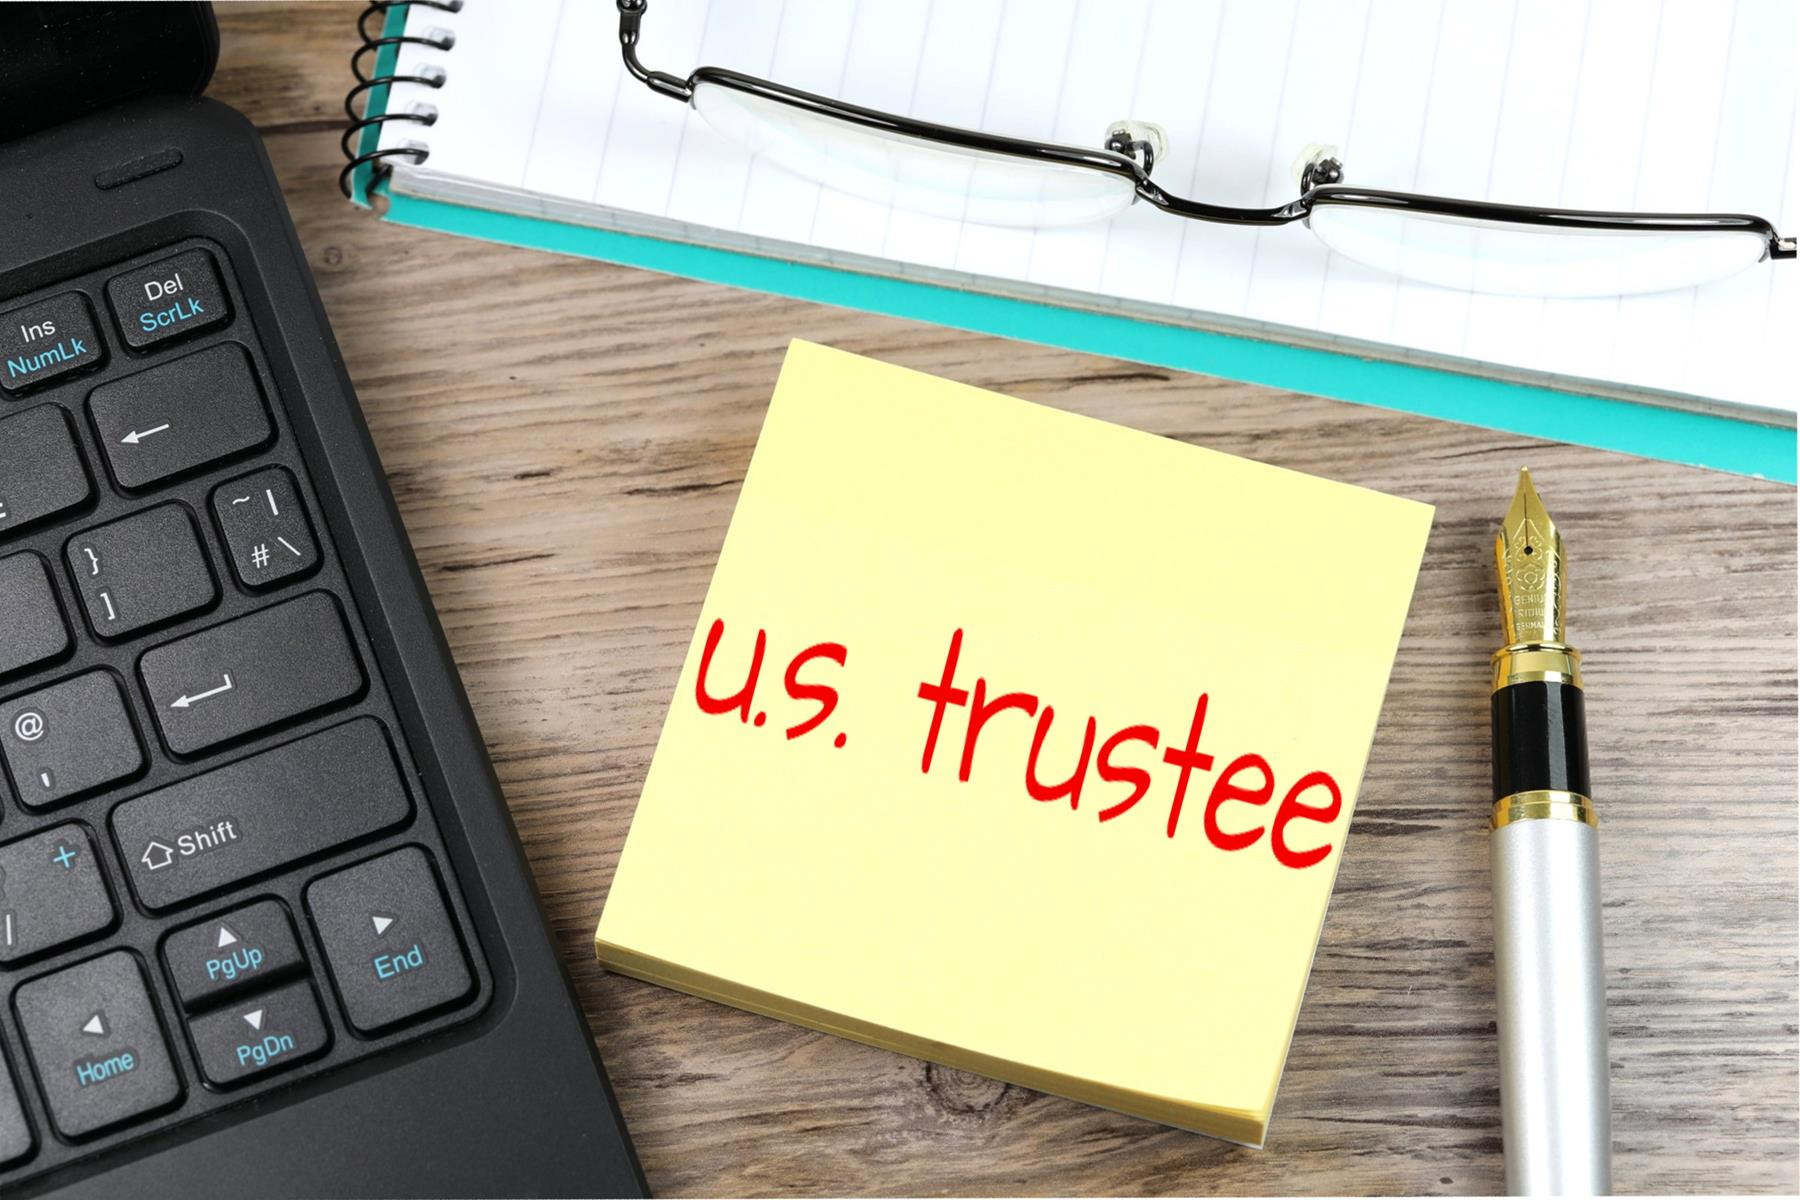 U S Trustee